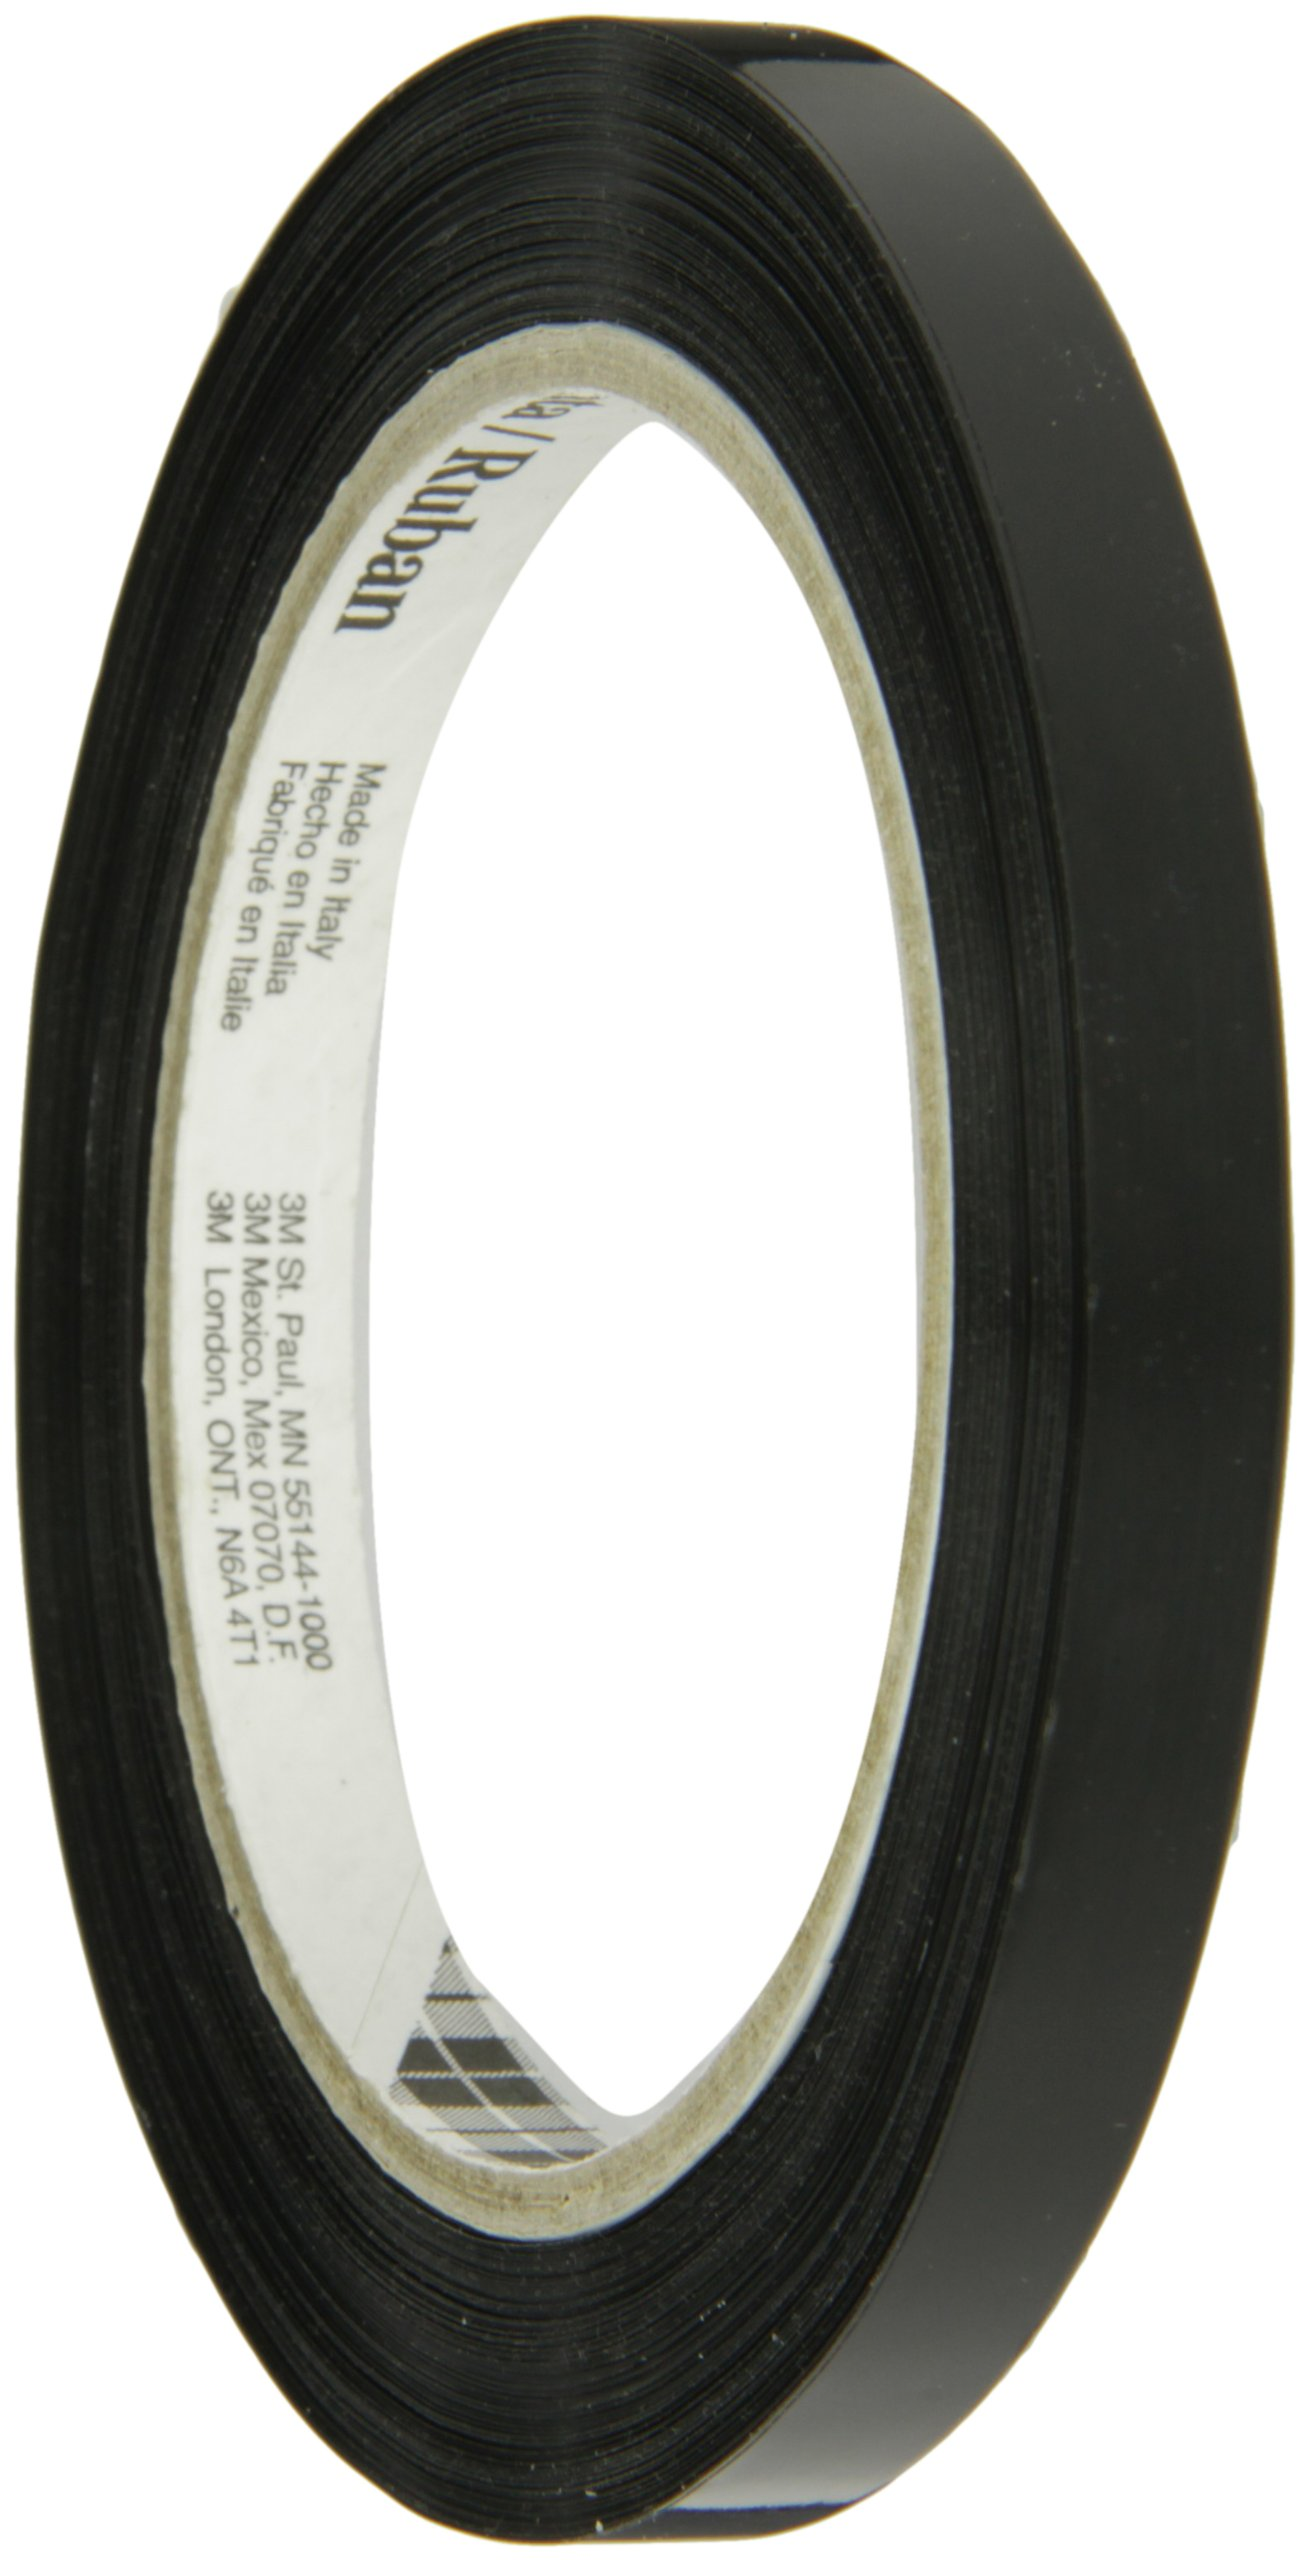 Tartan Strapping Tape 860 Black, 9 mm x 55 m (Case of 192)